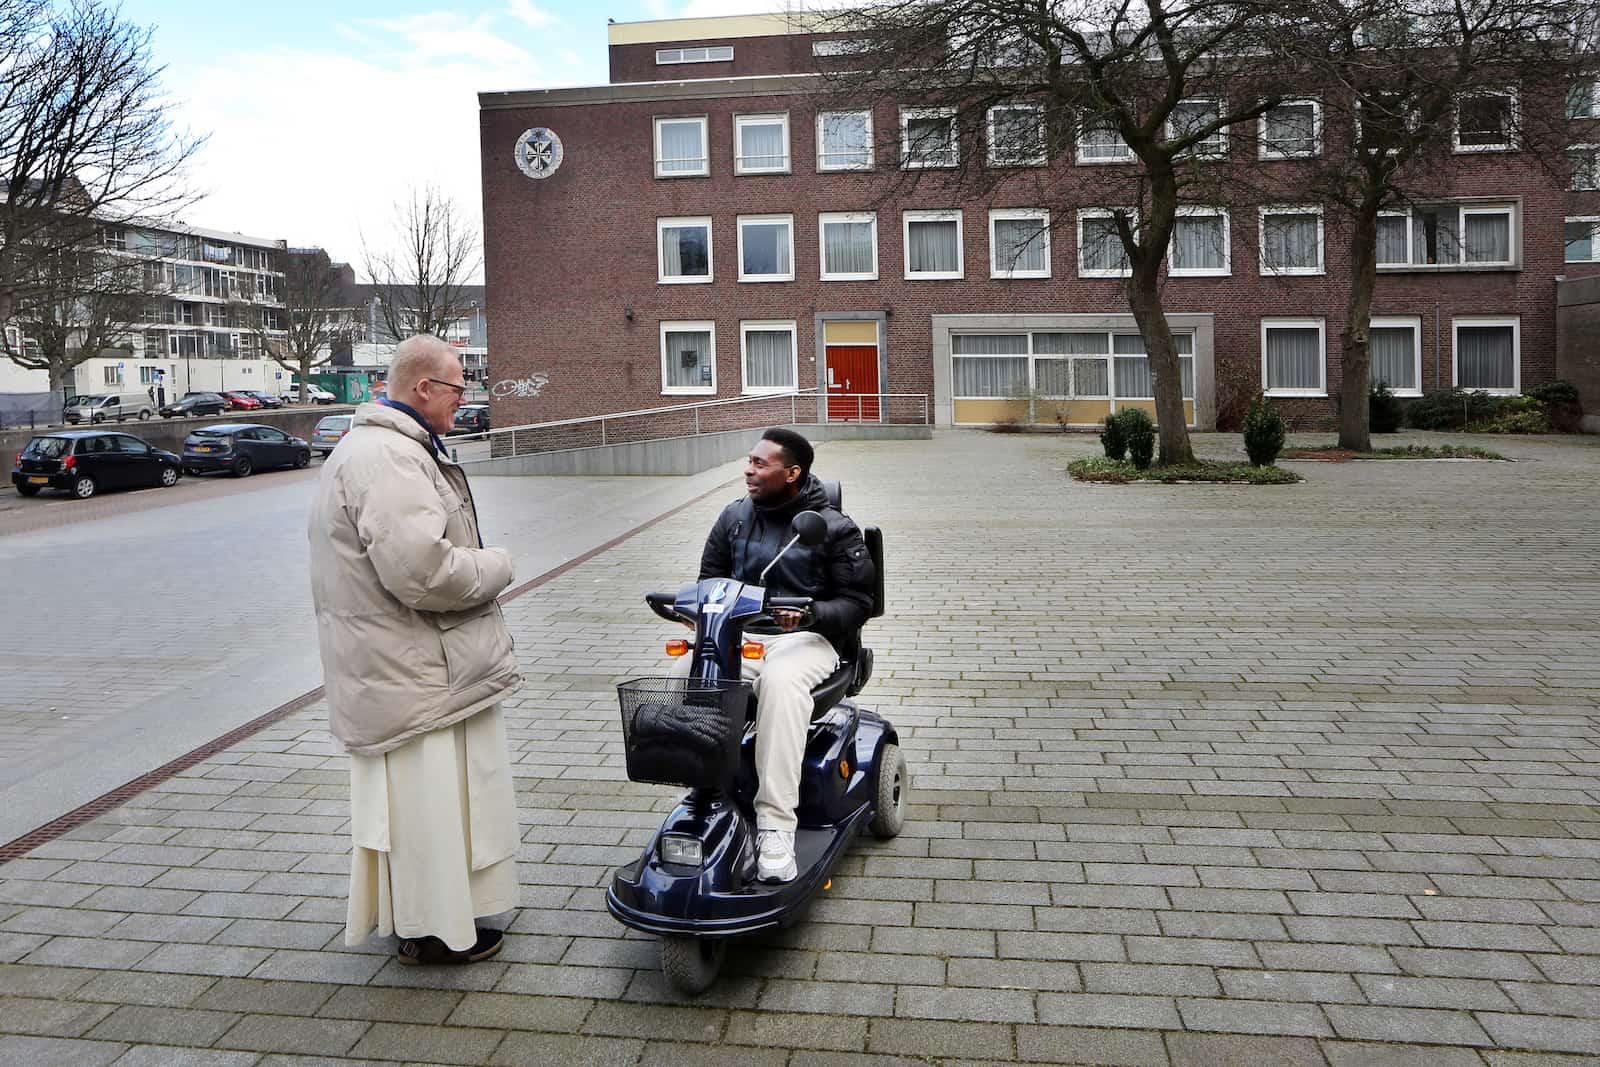 20180307_Rotterdam_Dominicanen_12_©RamonMangold-Duijnhoven